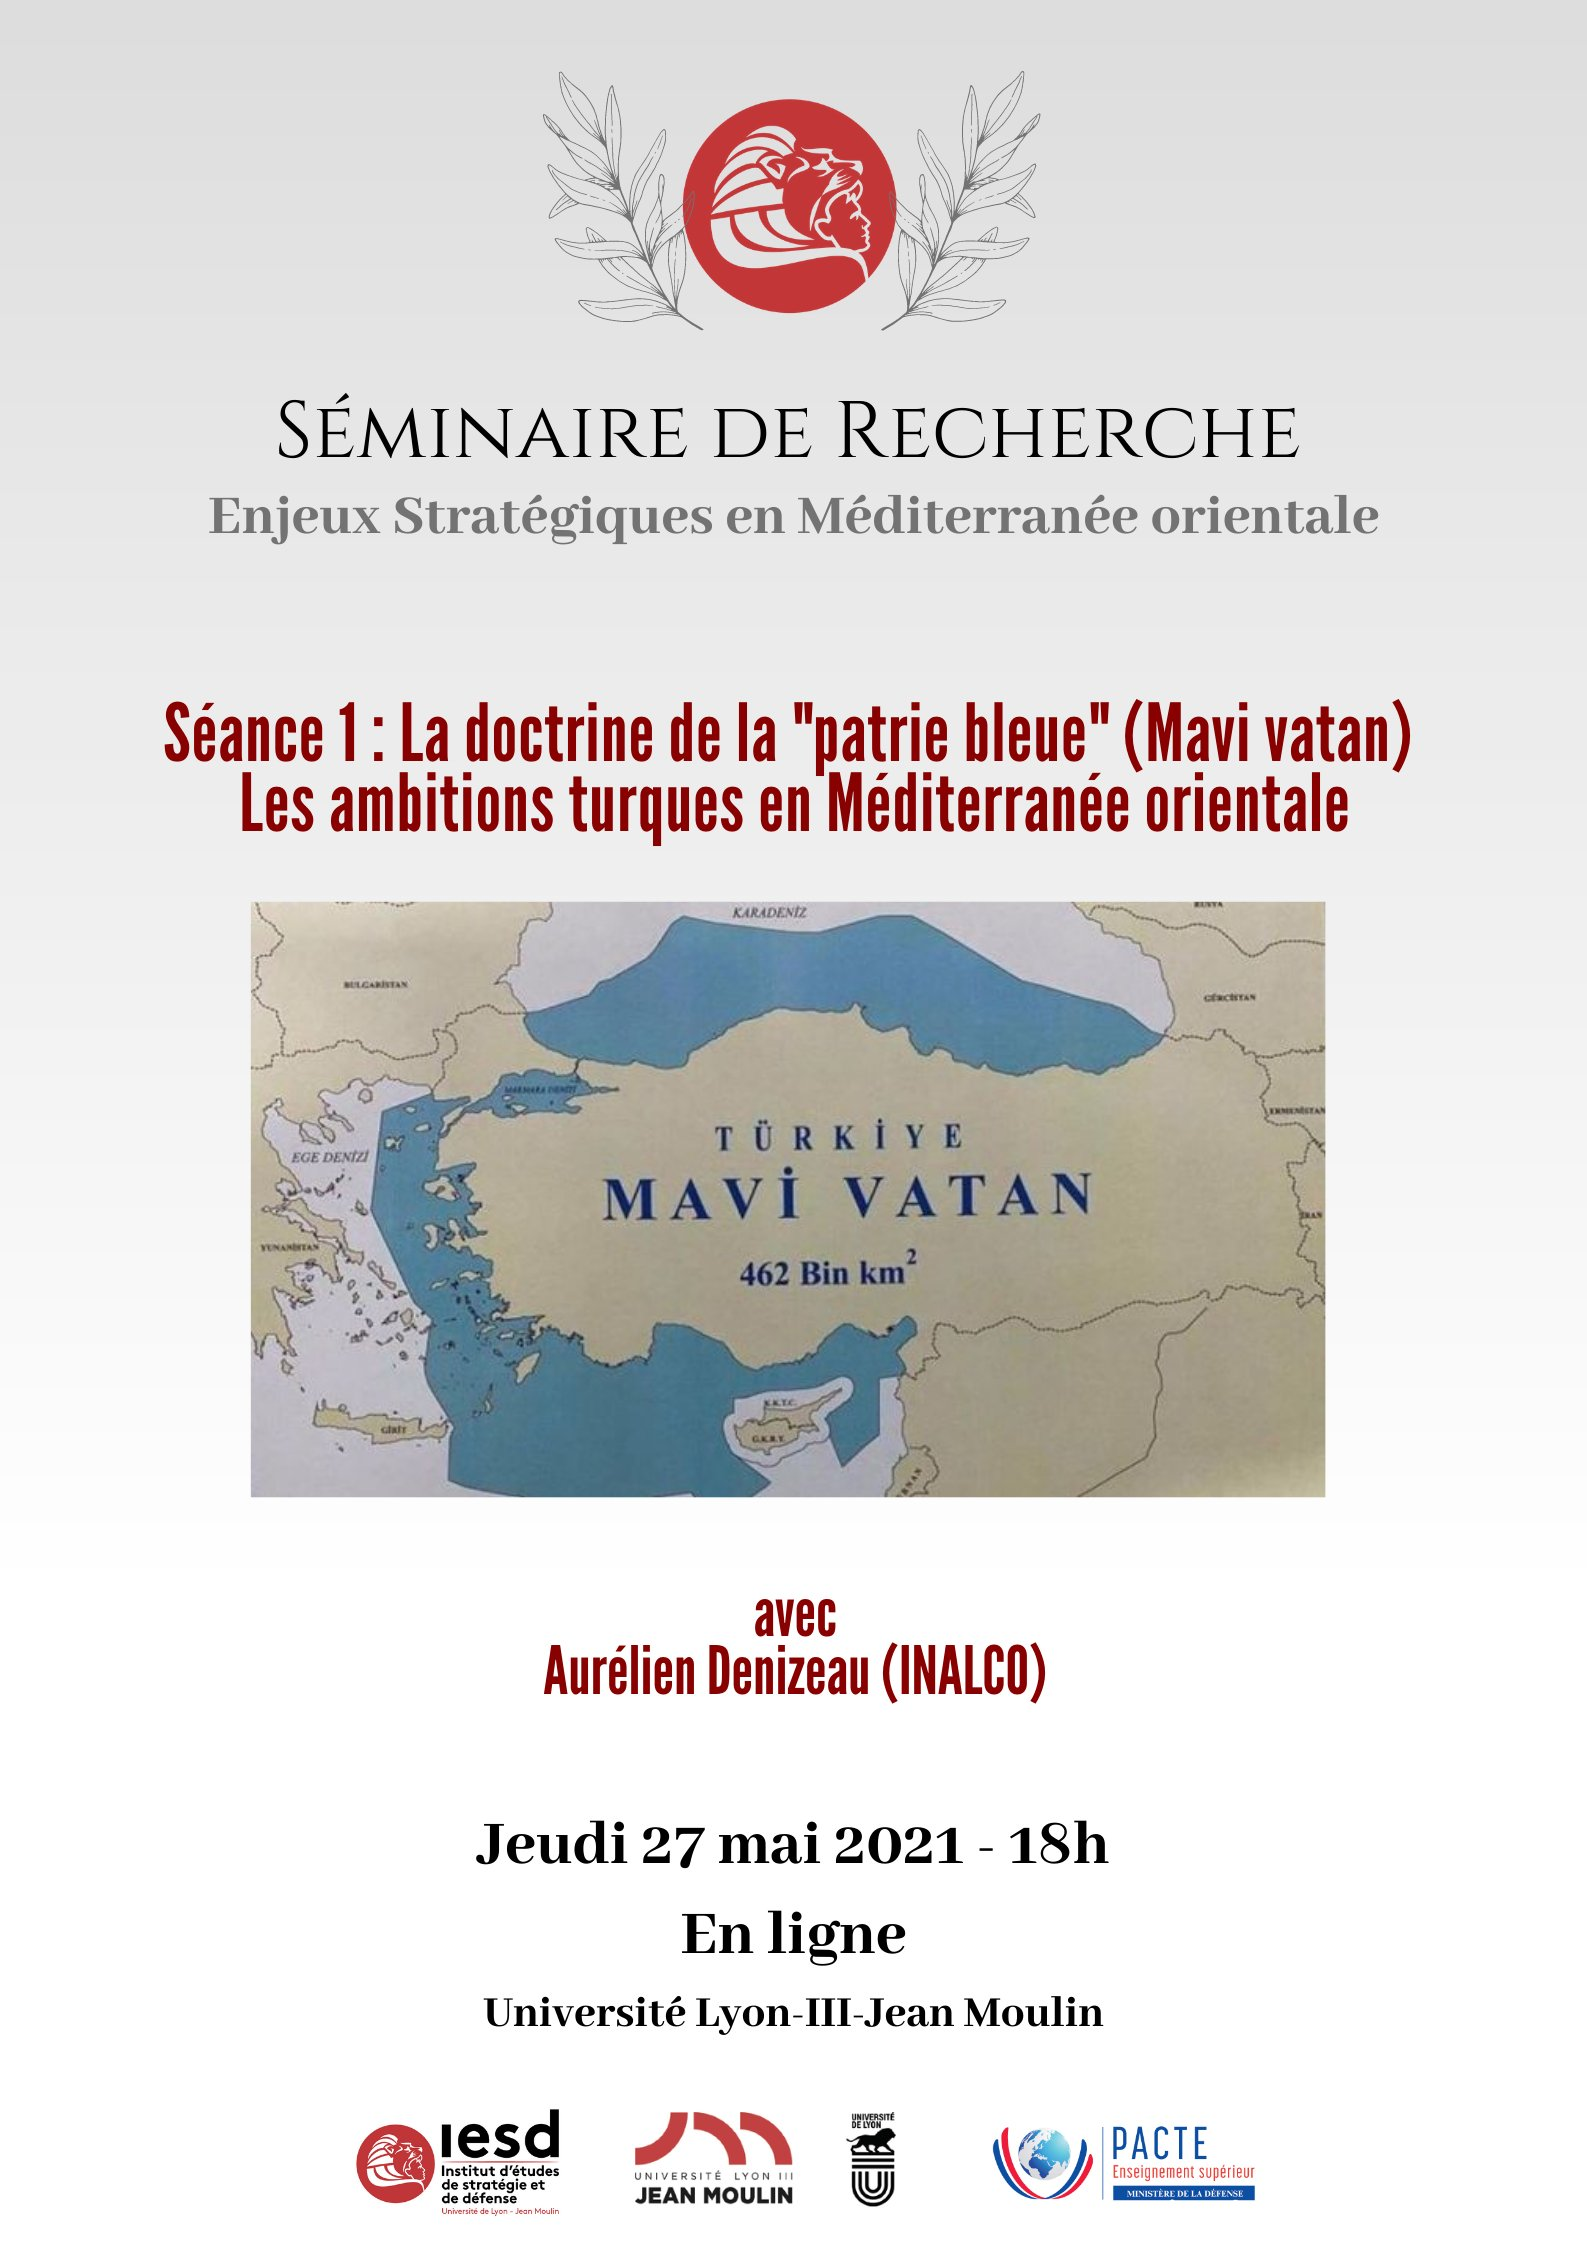 "Séance 1 : La doctrine de la ""partie bleue"" (mavi vatan)"